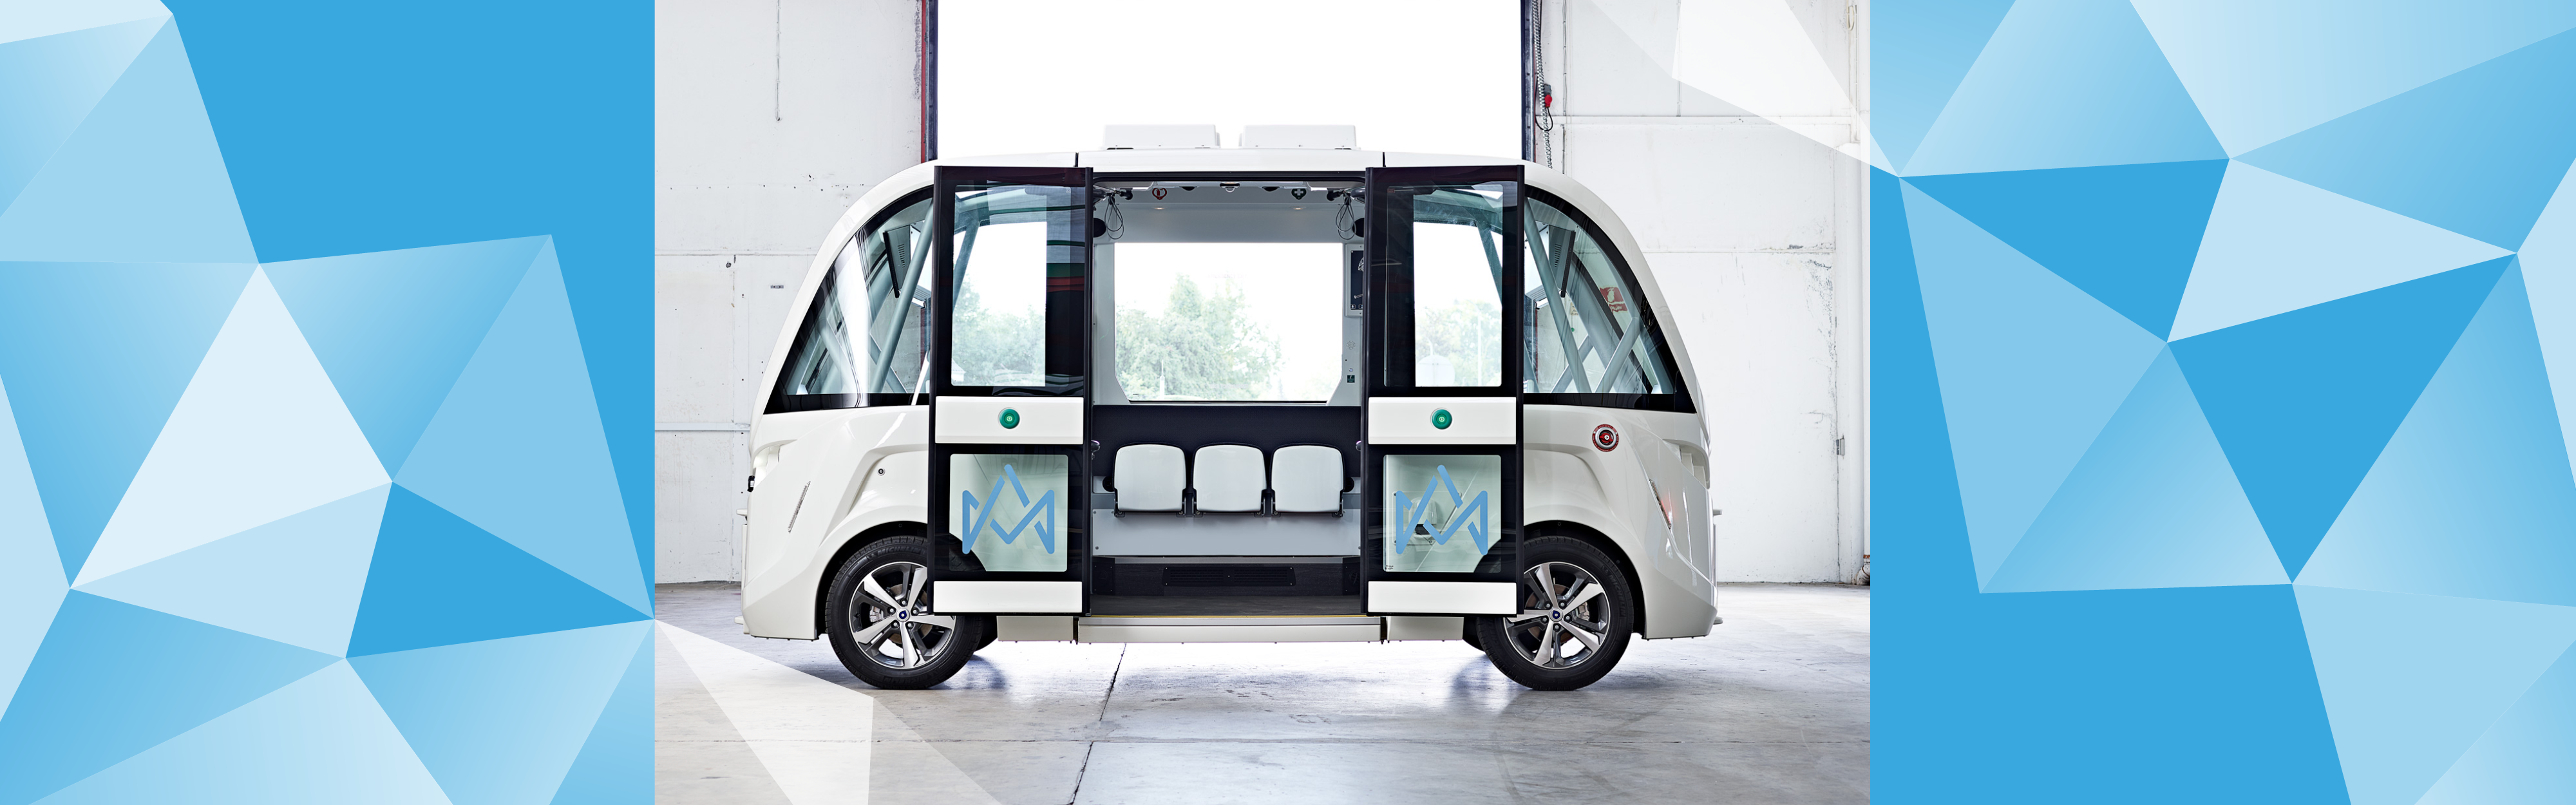 Godkendt som assessor til projekt med førerløse minibusser i Aalborg